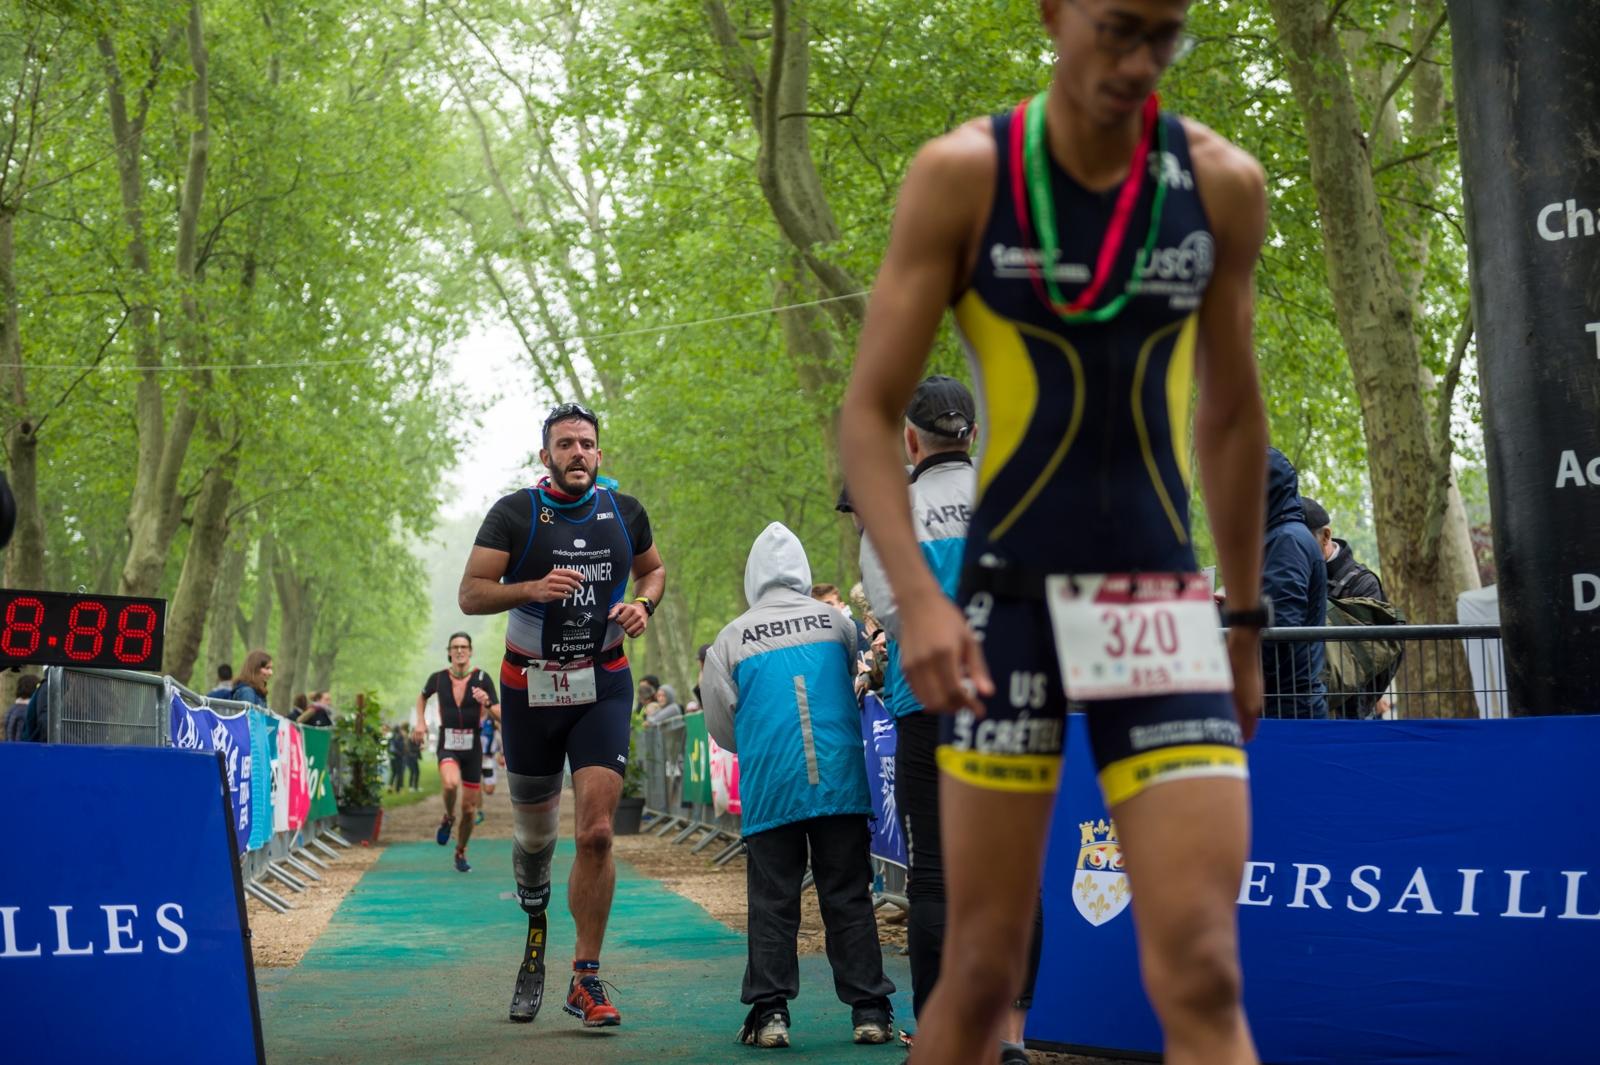 Versailles Triathlon Festival 2019